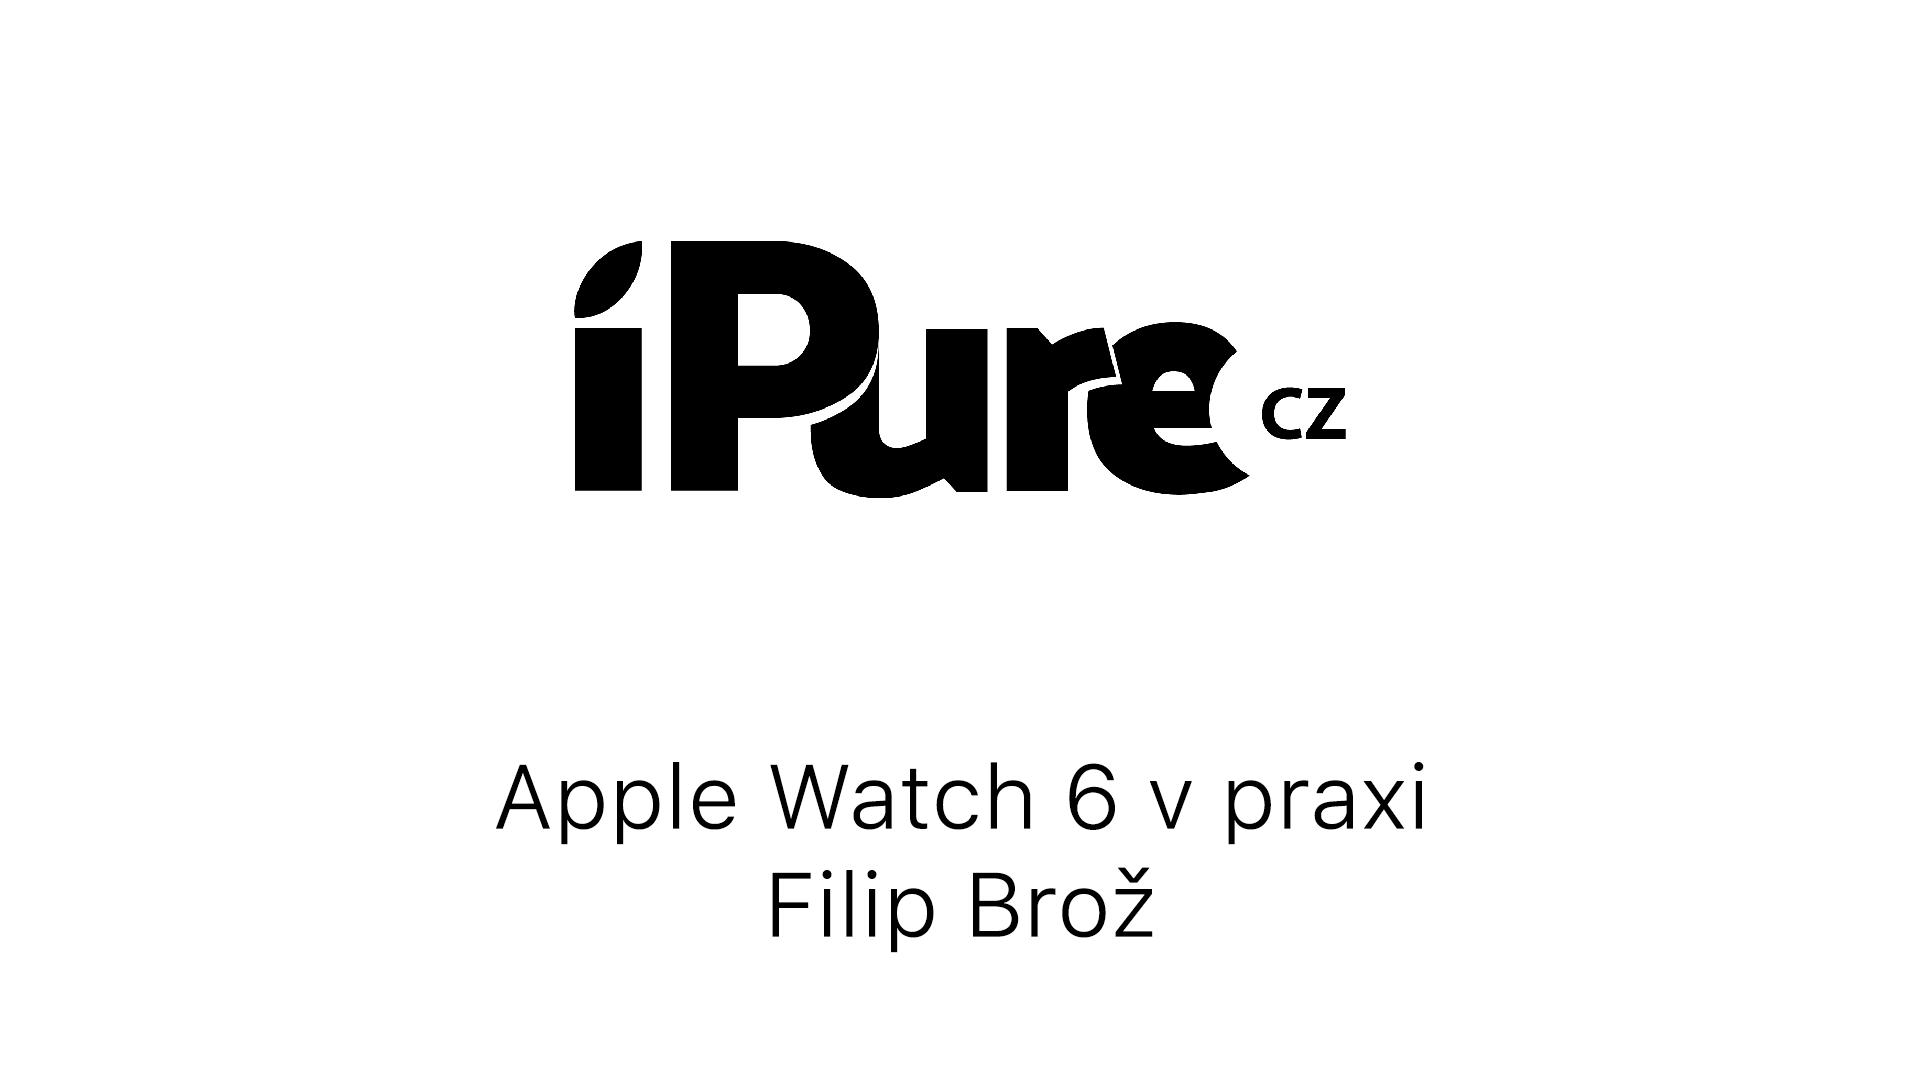 Apple Watch 6 v praxi